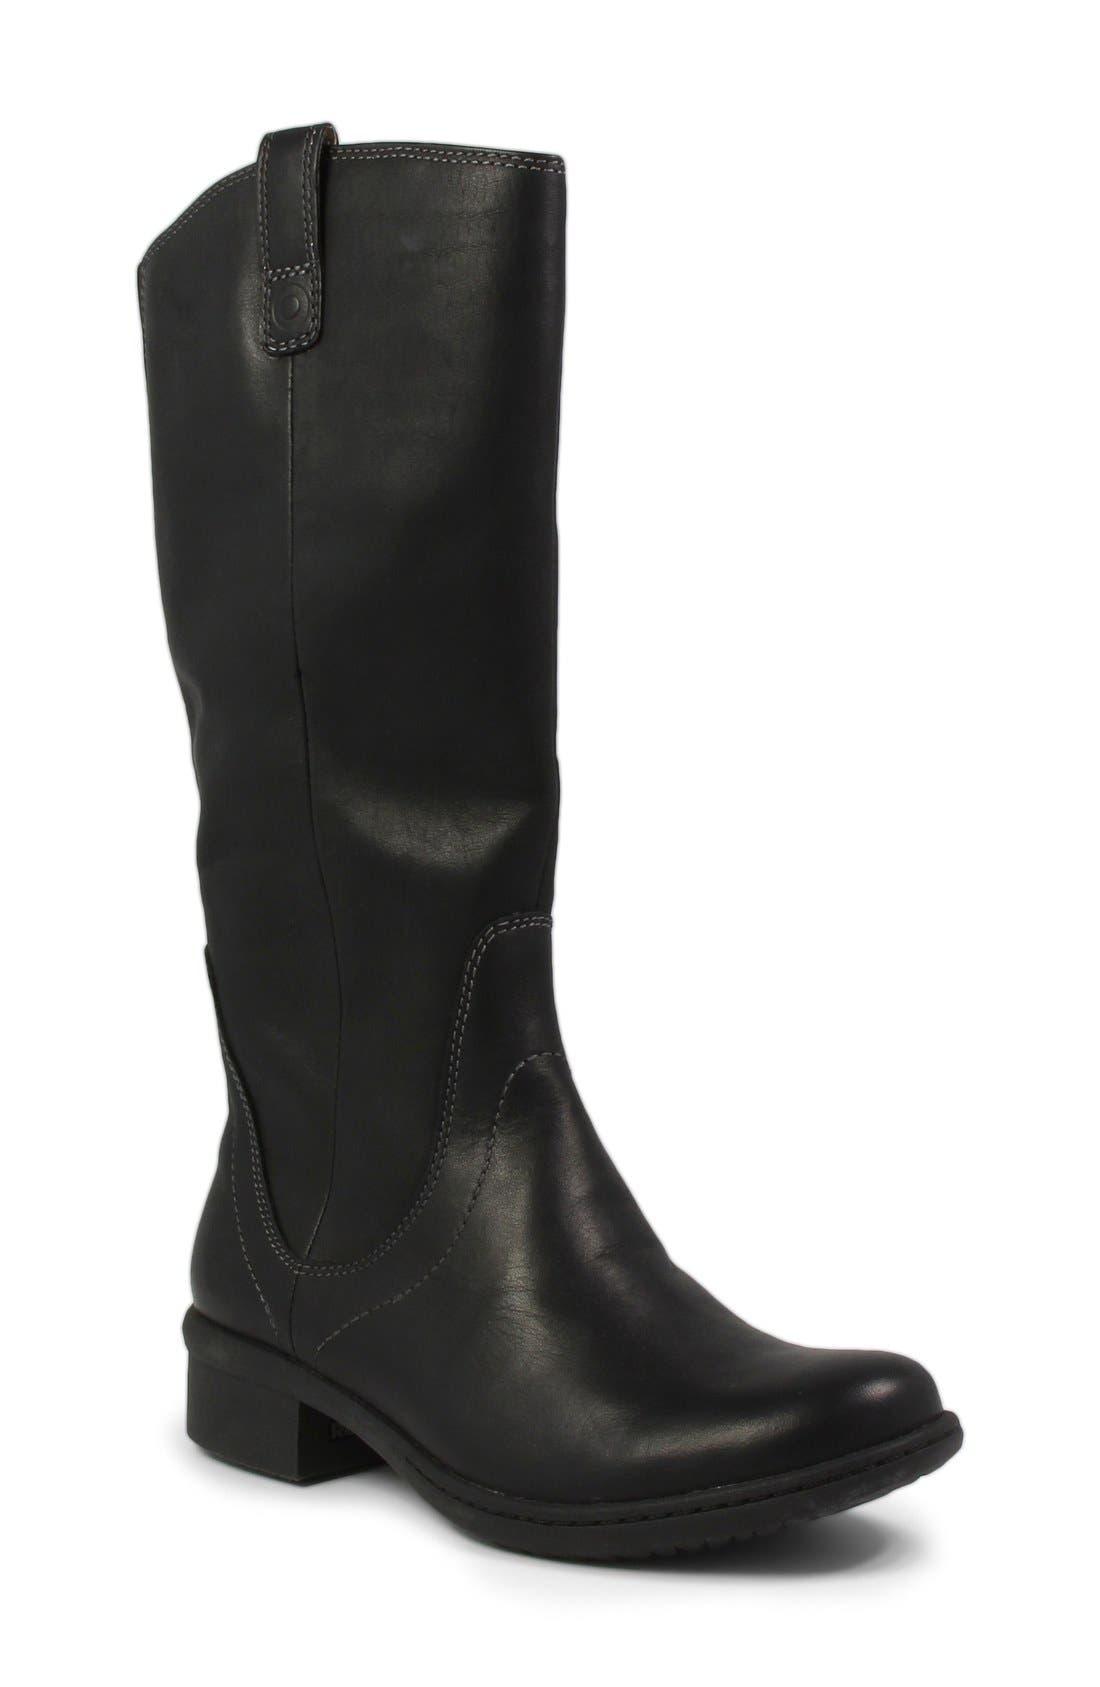 Alternate Image 1 Selected - Bogs 'Kristina' Waterproof Tall Boot (Women)